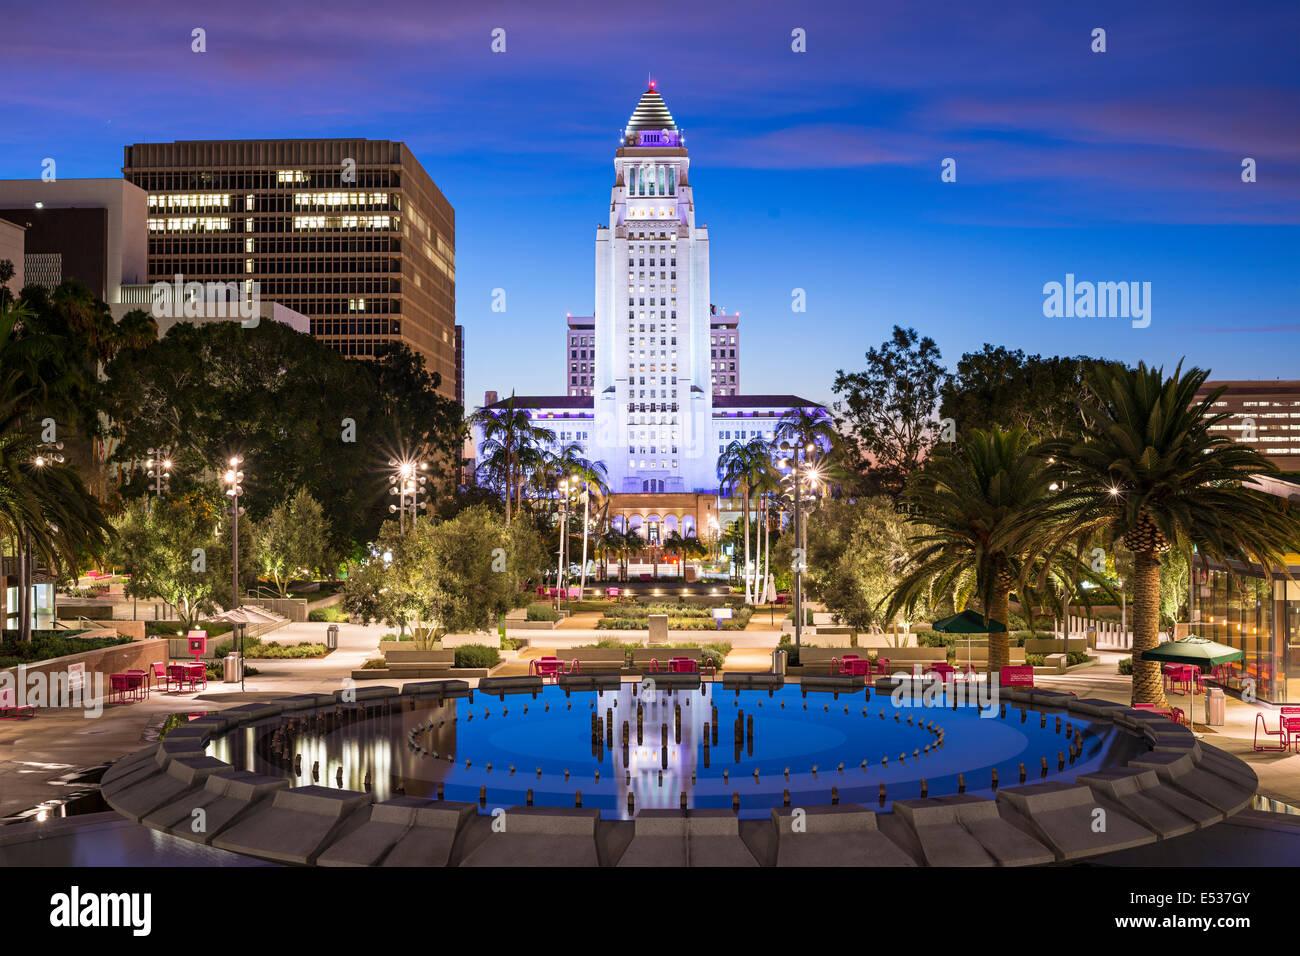 Los Angeles, Kalifornien, USA Innenstadt am Rathaus. Stockbild